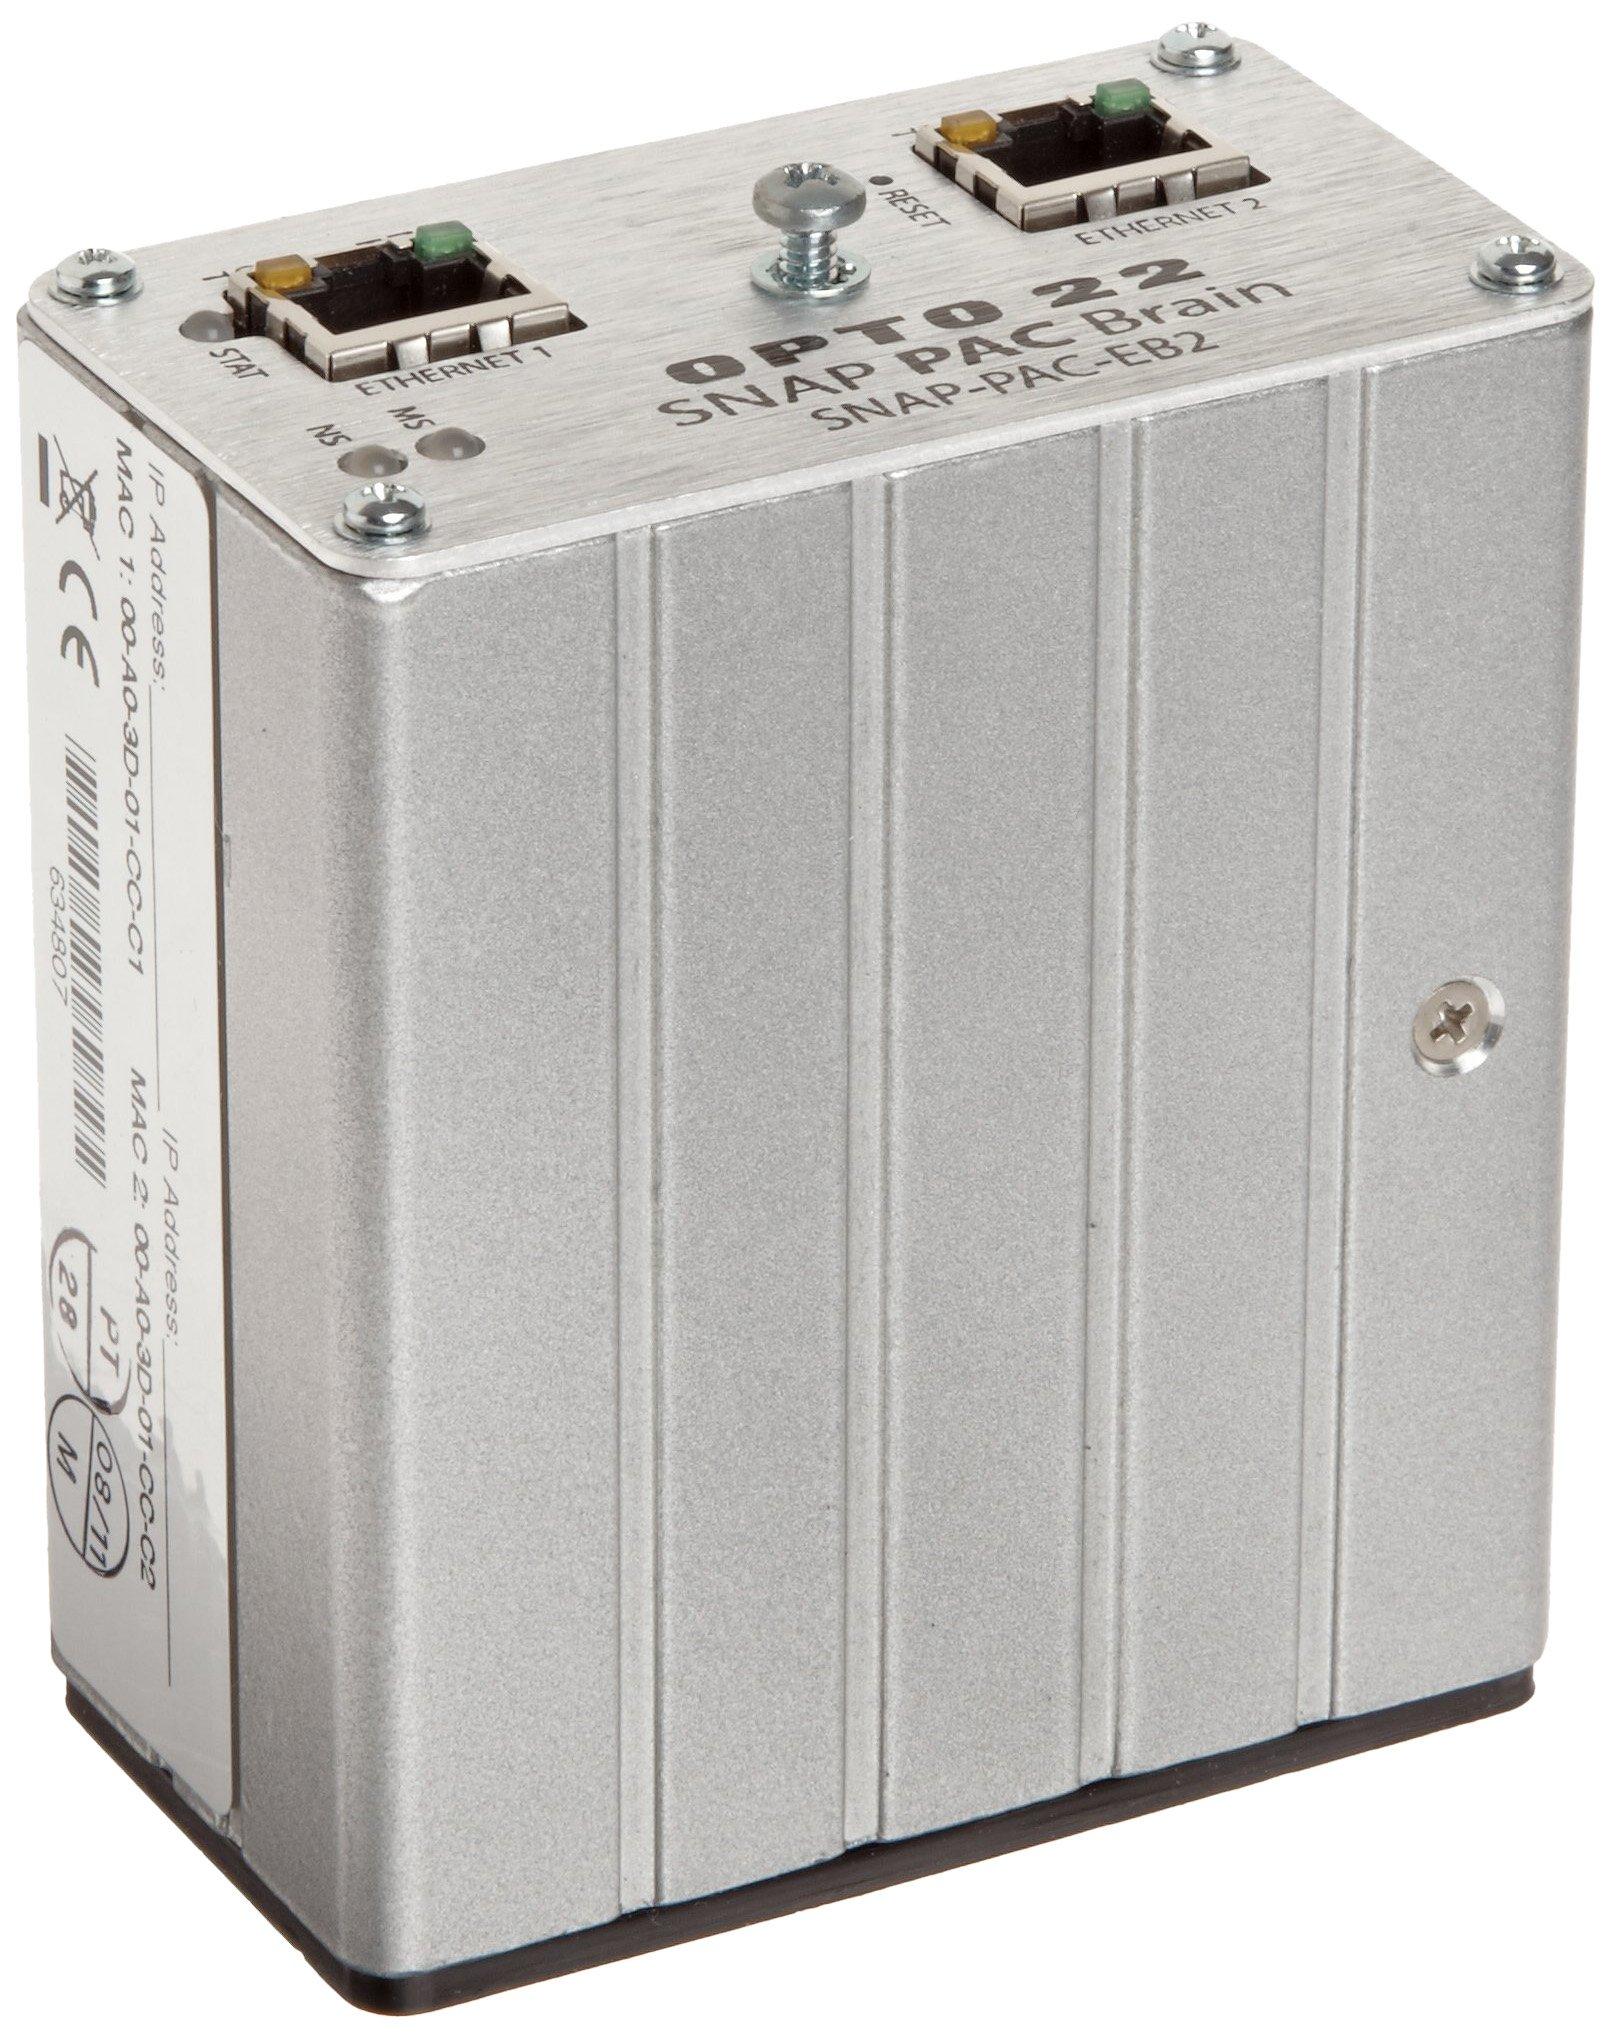 Opto 22 SNAP-PAC-EB2 - SNAP PAC Ethernet Brain, Analog/Digital/Serial, 16 MB RAM by Opto 22